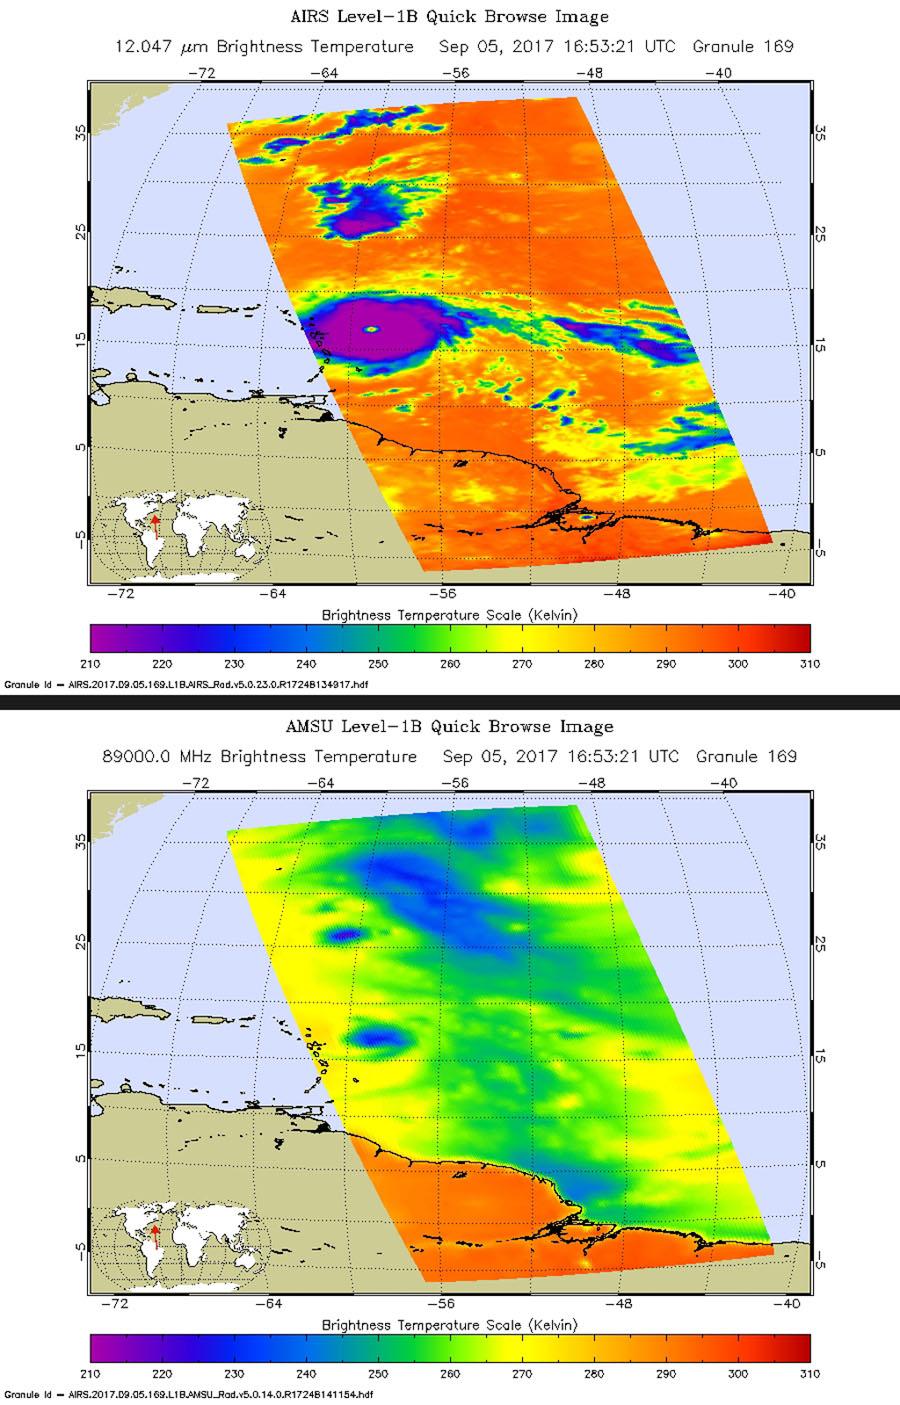 NASA's Aqua satellite shows what Hurricane Irma looked like when Aqua passed overhead just before 1 p.m. local time on Sept. 5, 2017.